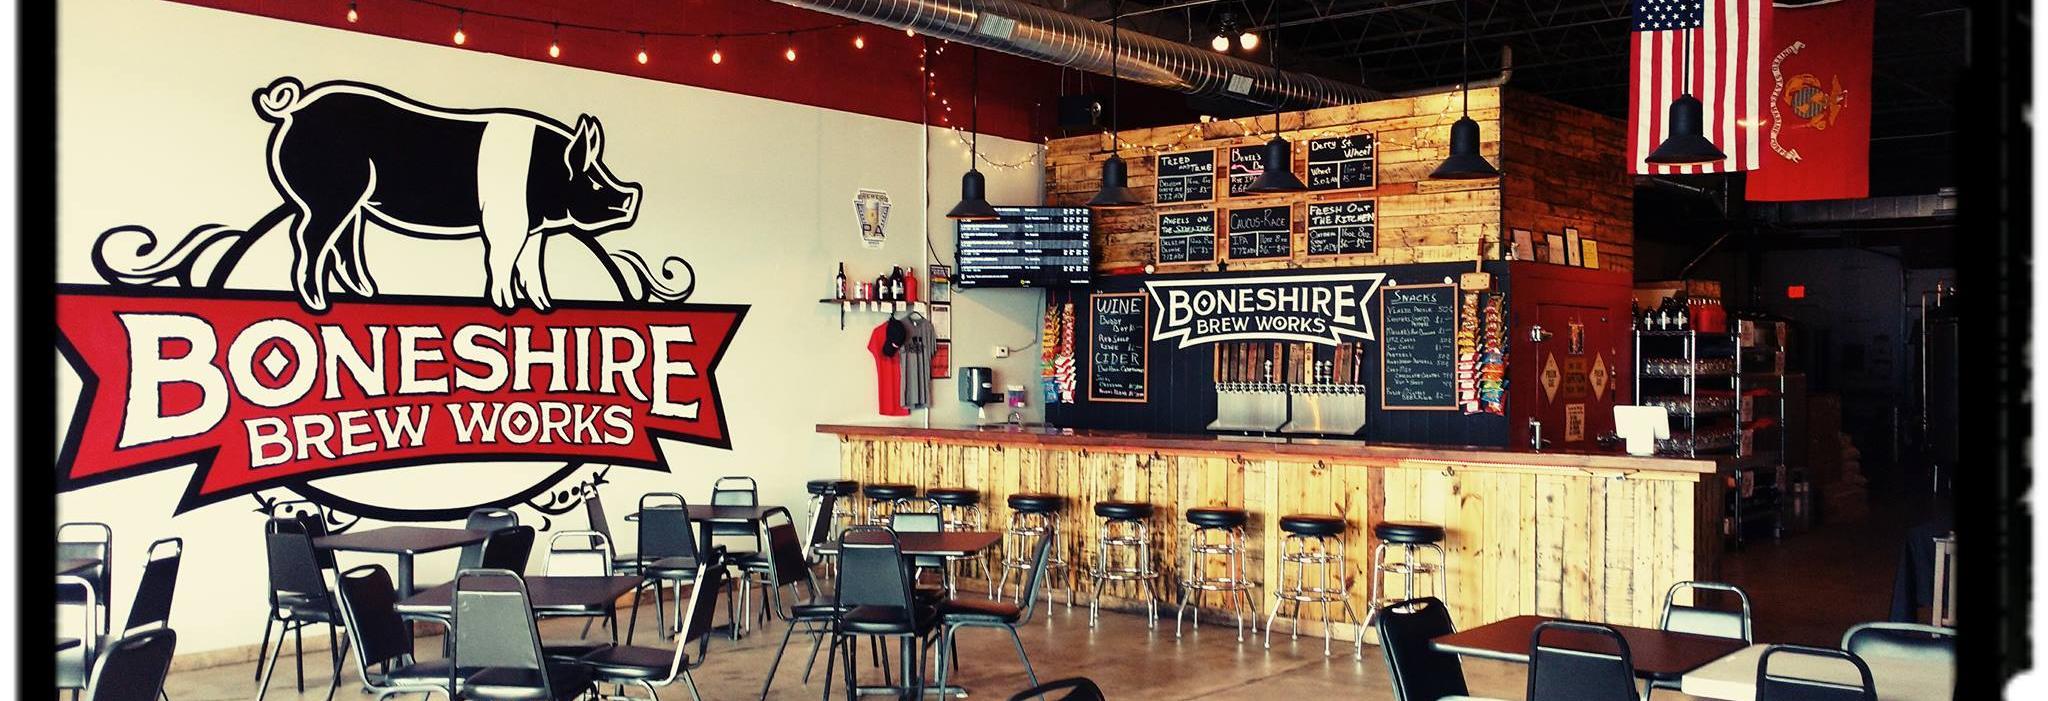 Boneshire Brew Works in Harrisburg, PA banner